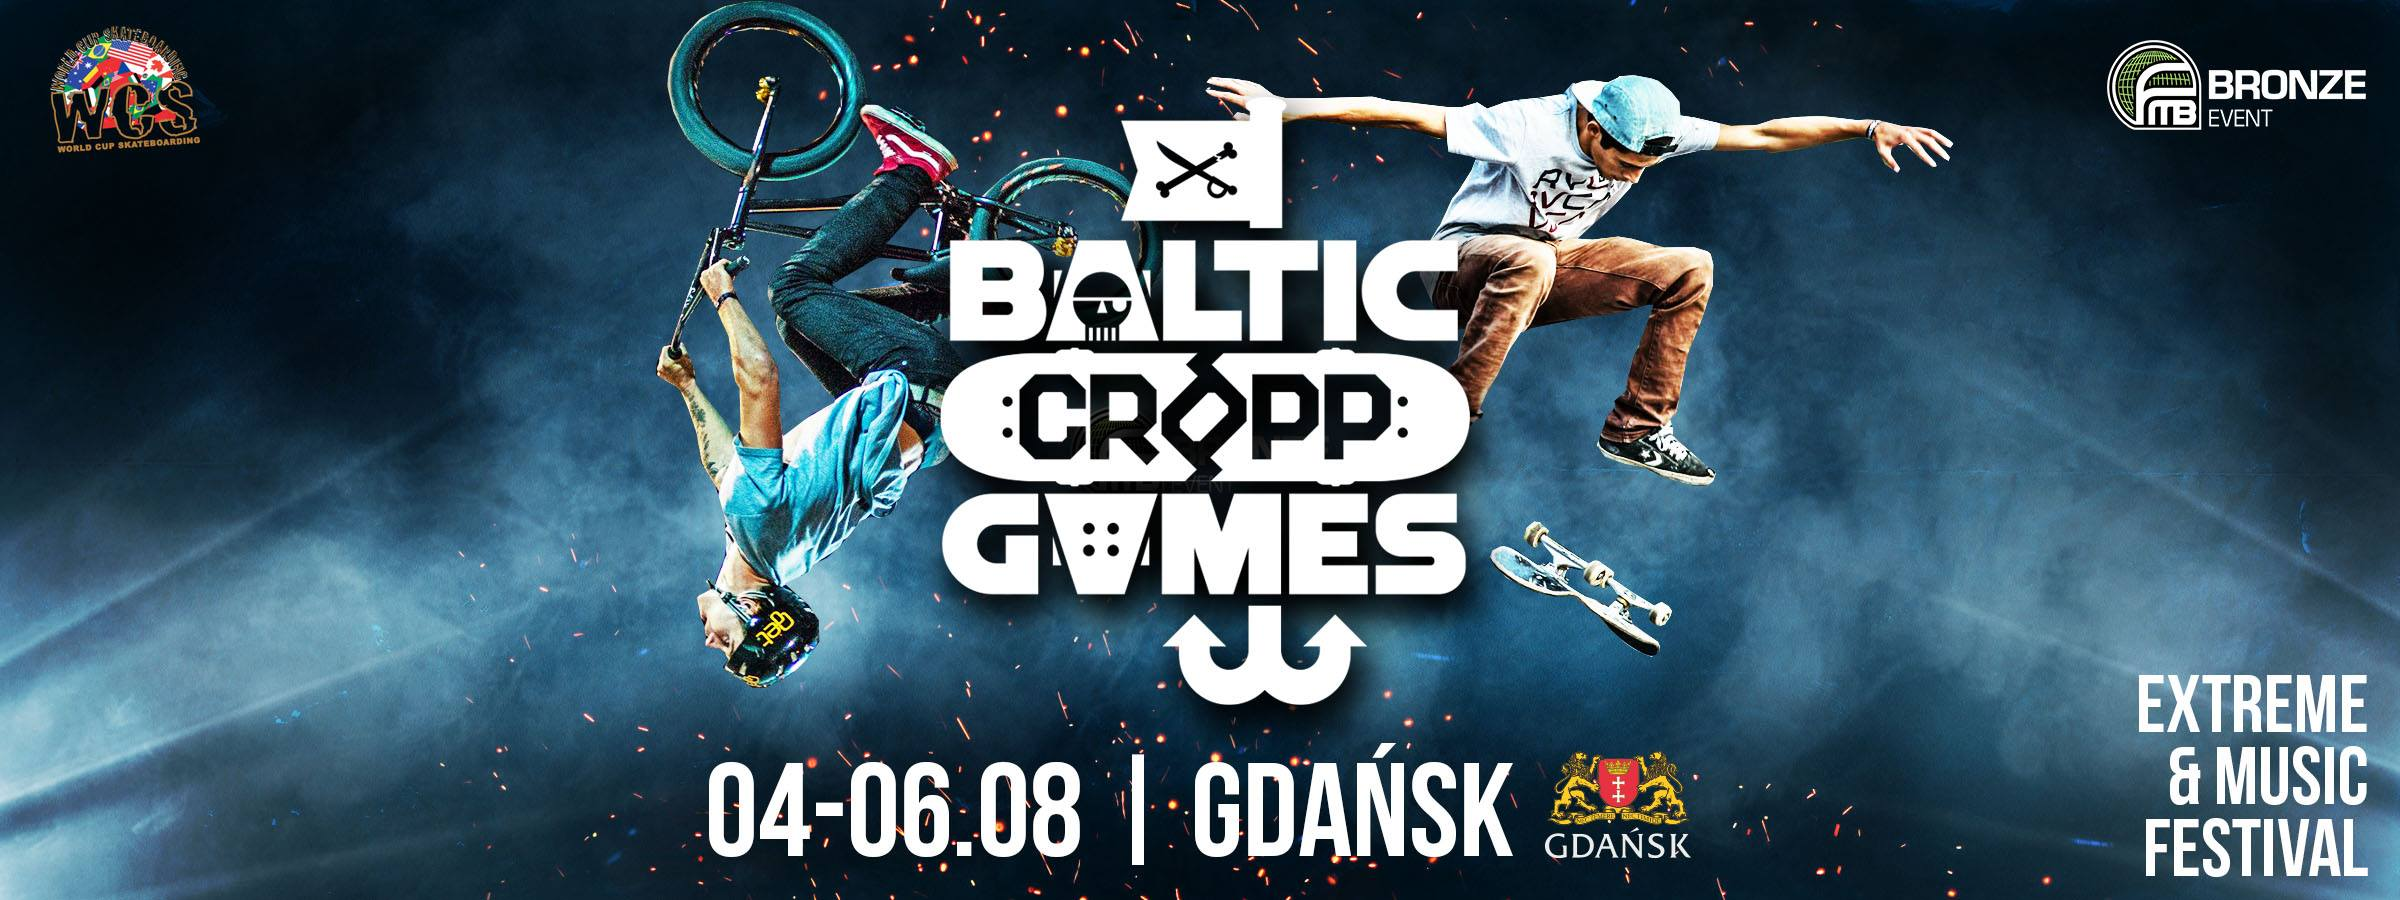 Baltic Games 2017